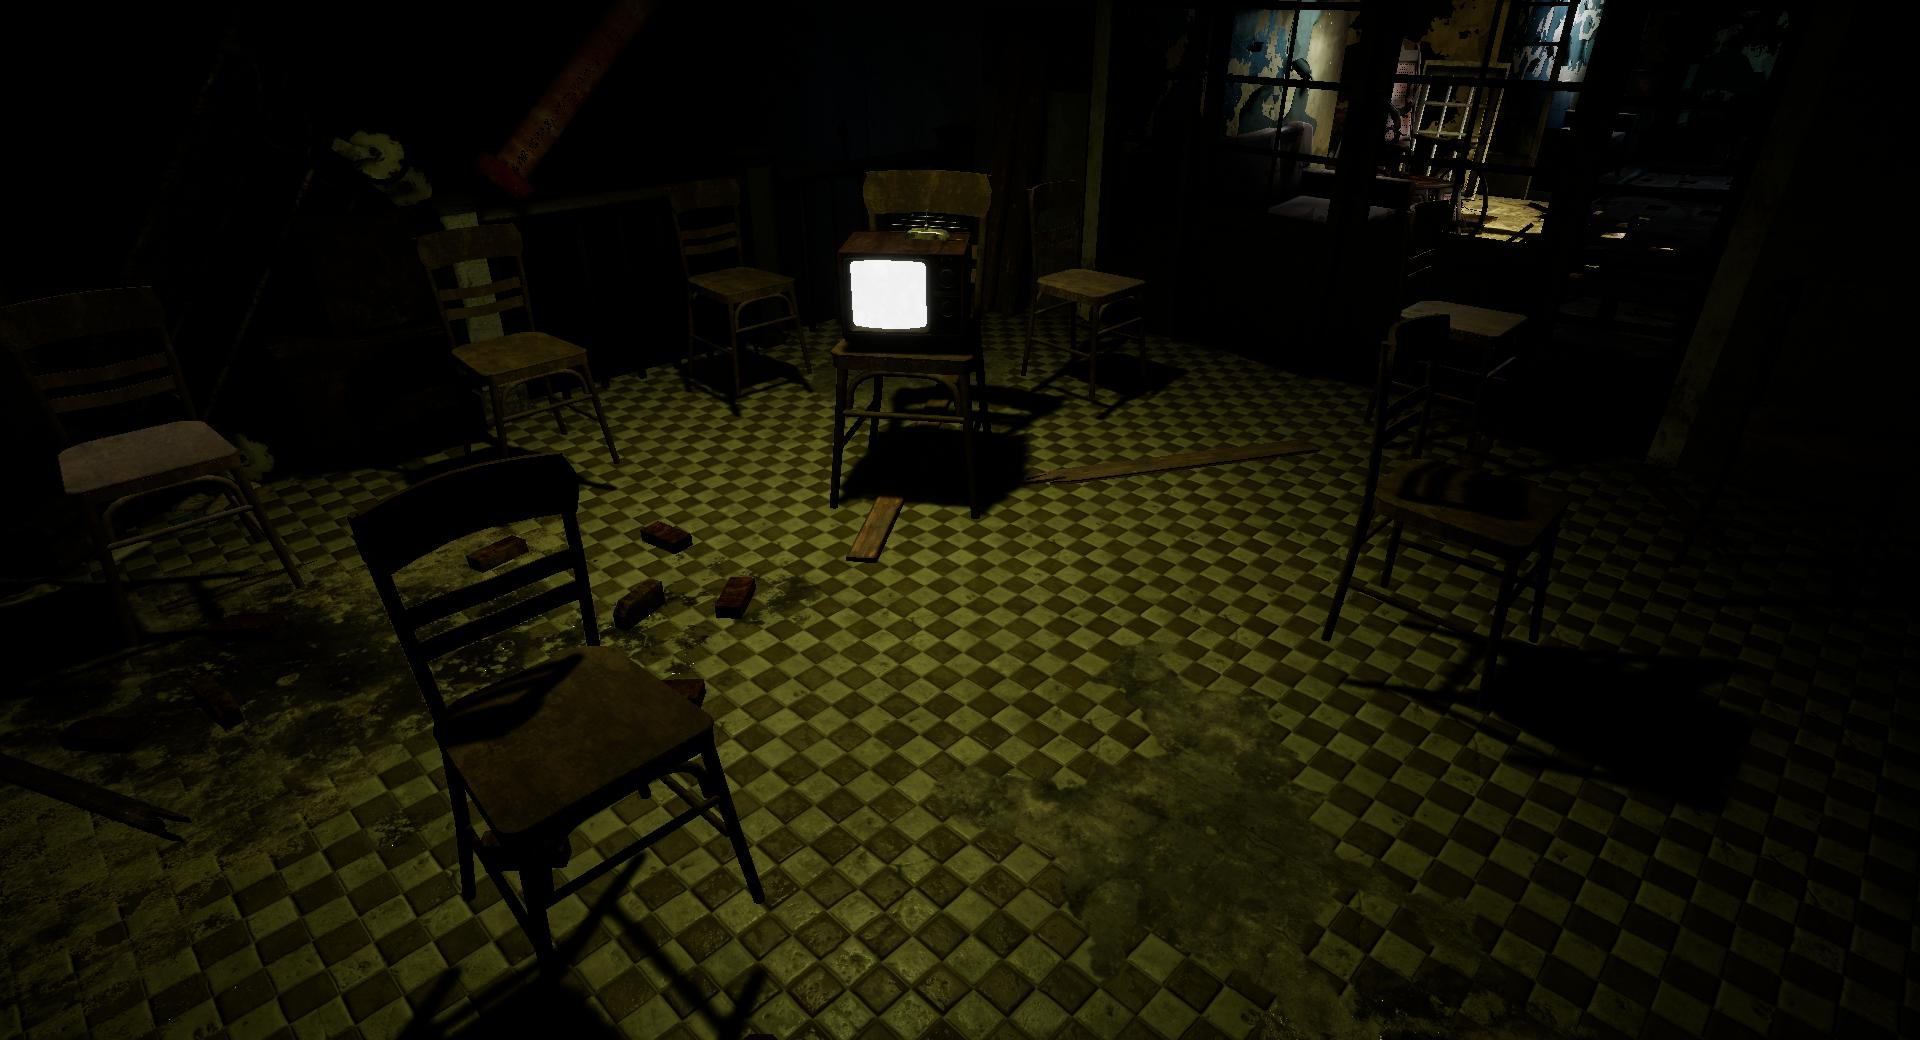 Hospital of horror VR haunted house